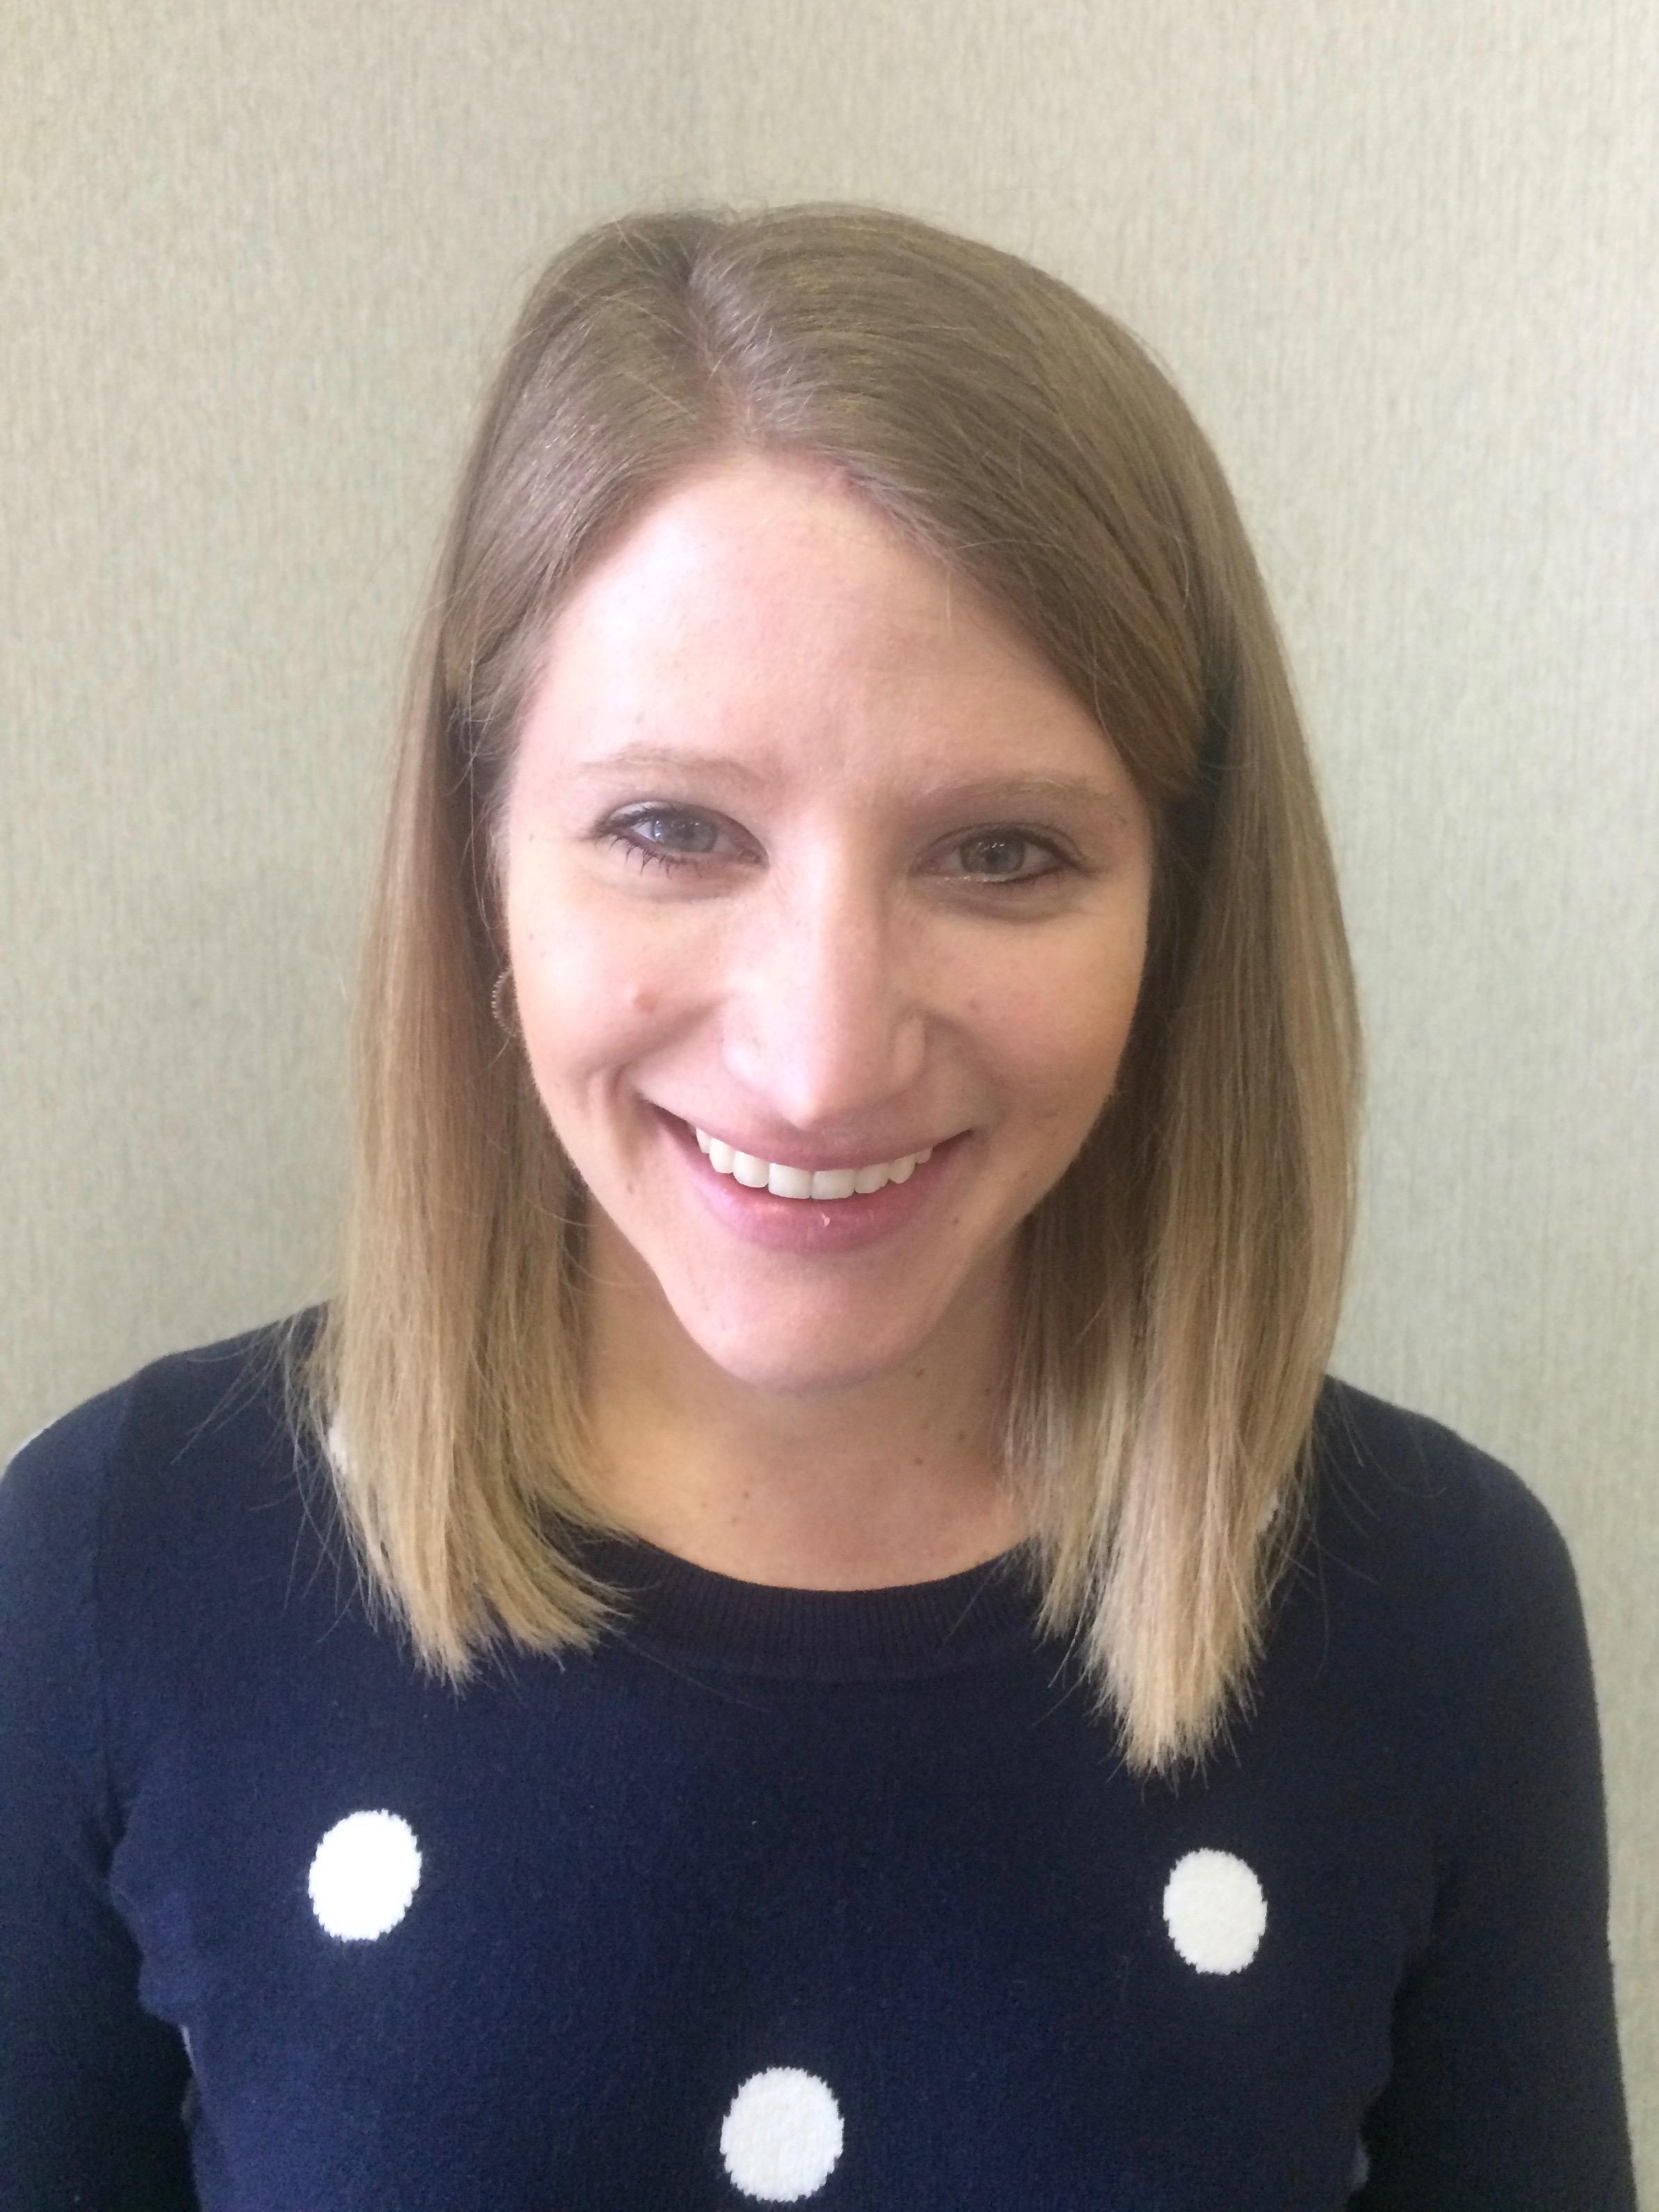 Head Counselor: Kara Buter